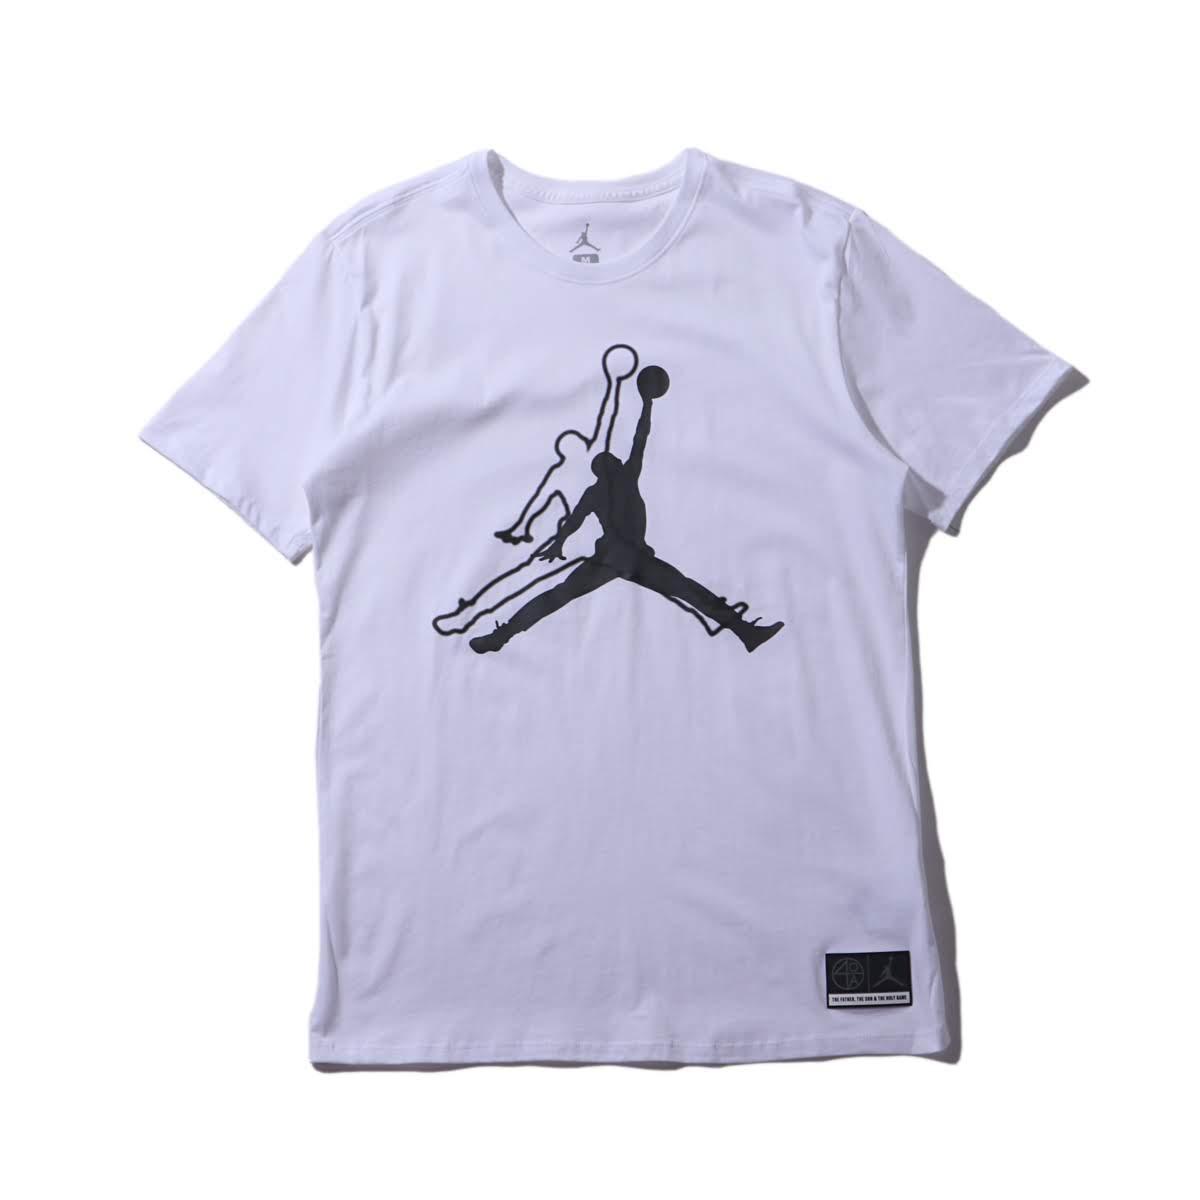 508cafc917b2 The Jordan sportswear jump man